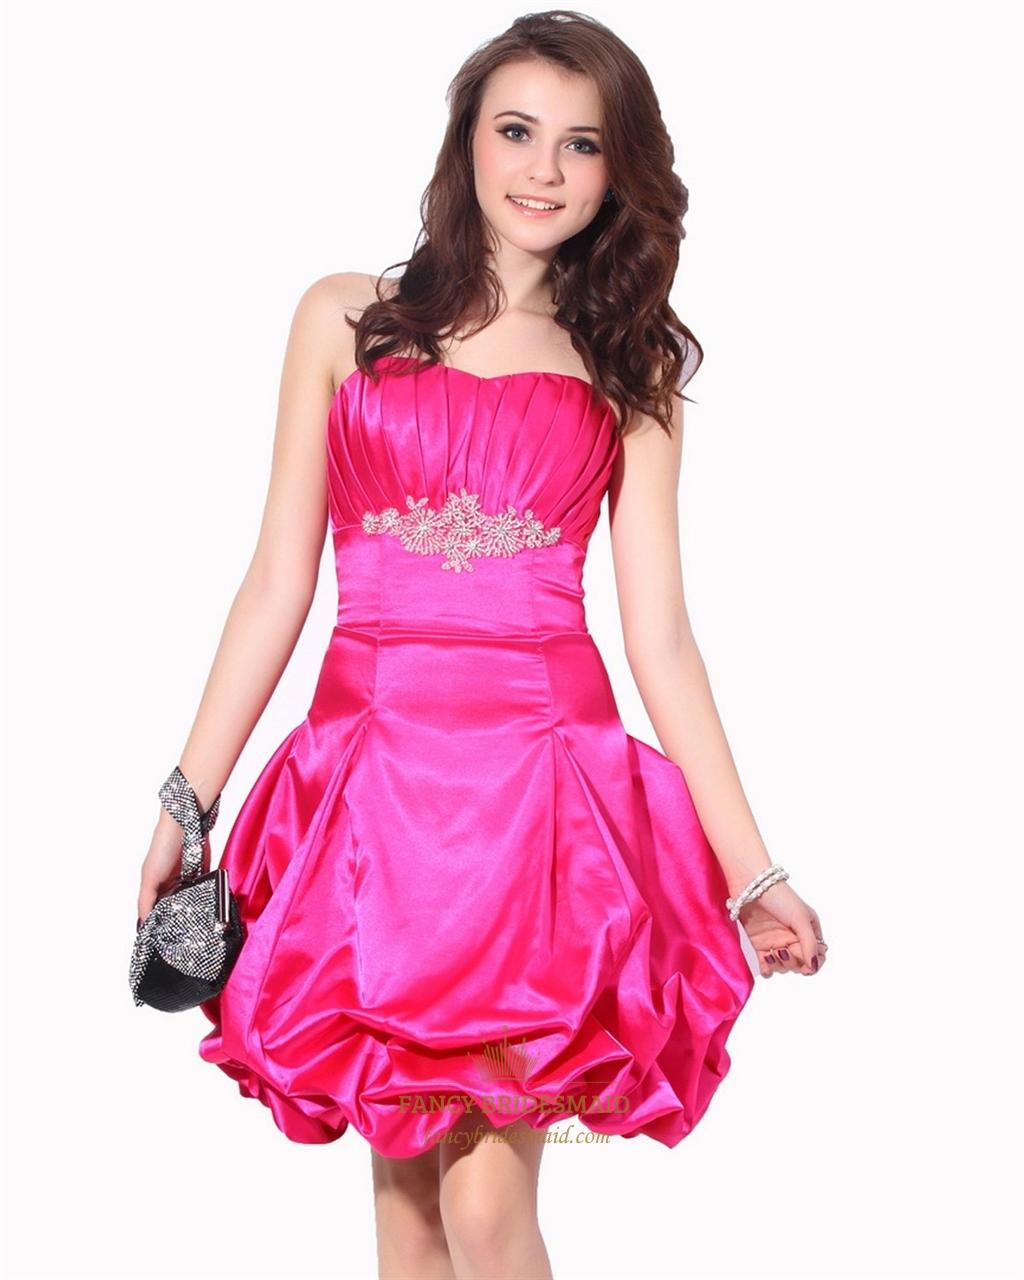 d9c8ecc7c1 Hot Pink Strapless Beaded Taffeta Cocktail Dress With Bubble Skirt SKU  -NW668